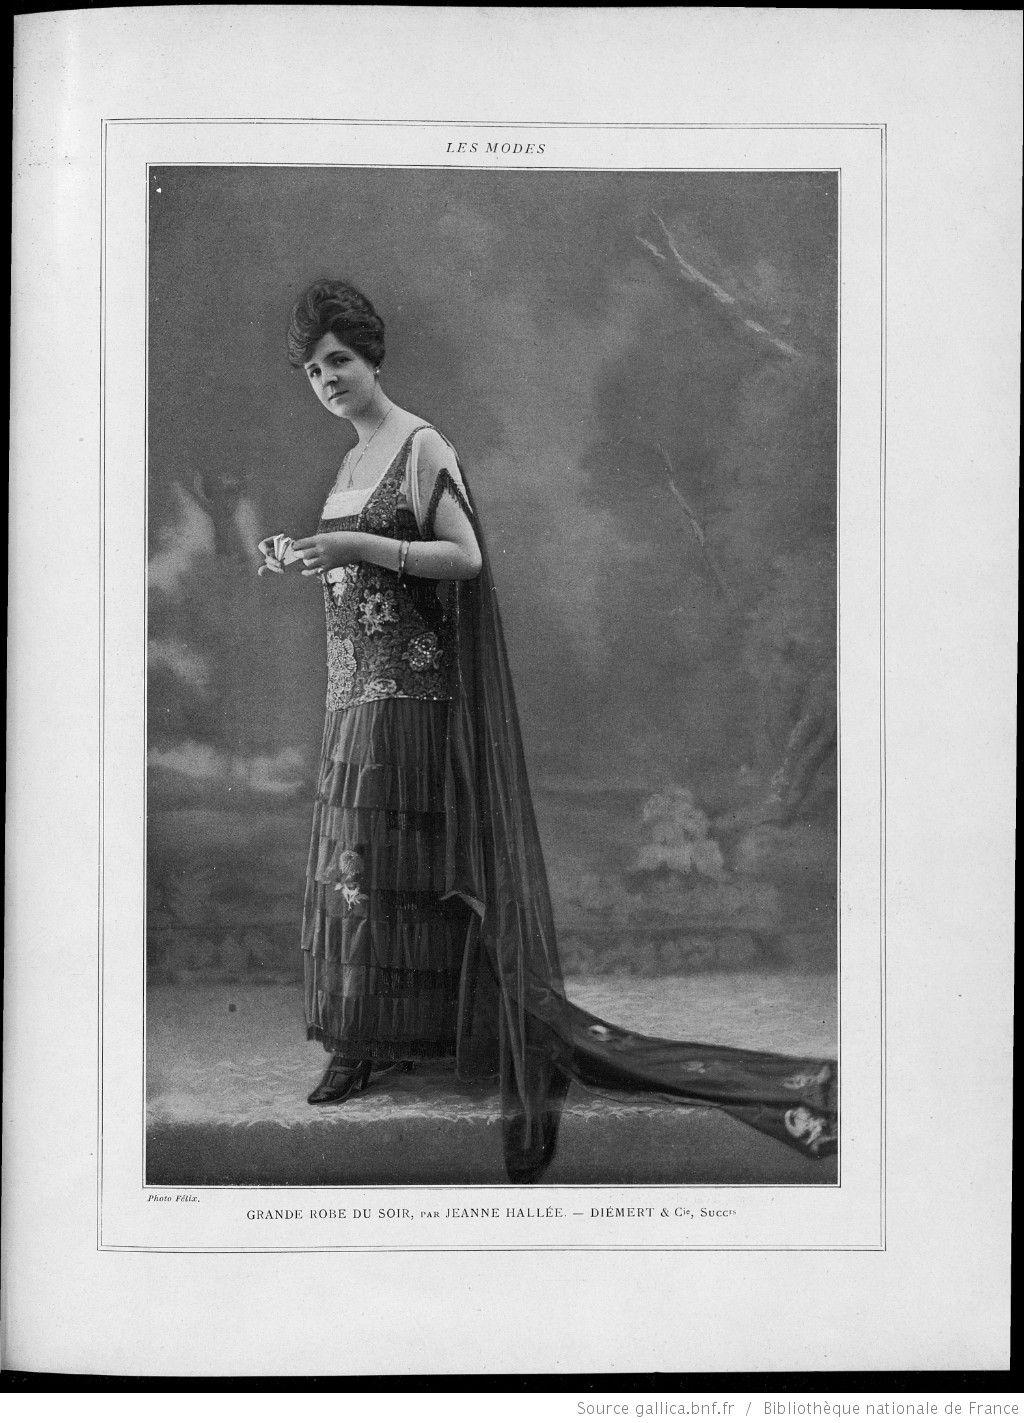 1917 - Grande robe du soir - Jeanne Hallé